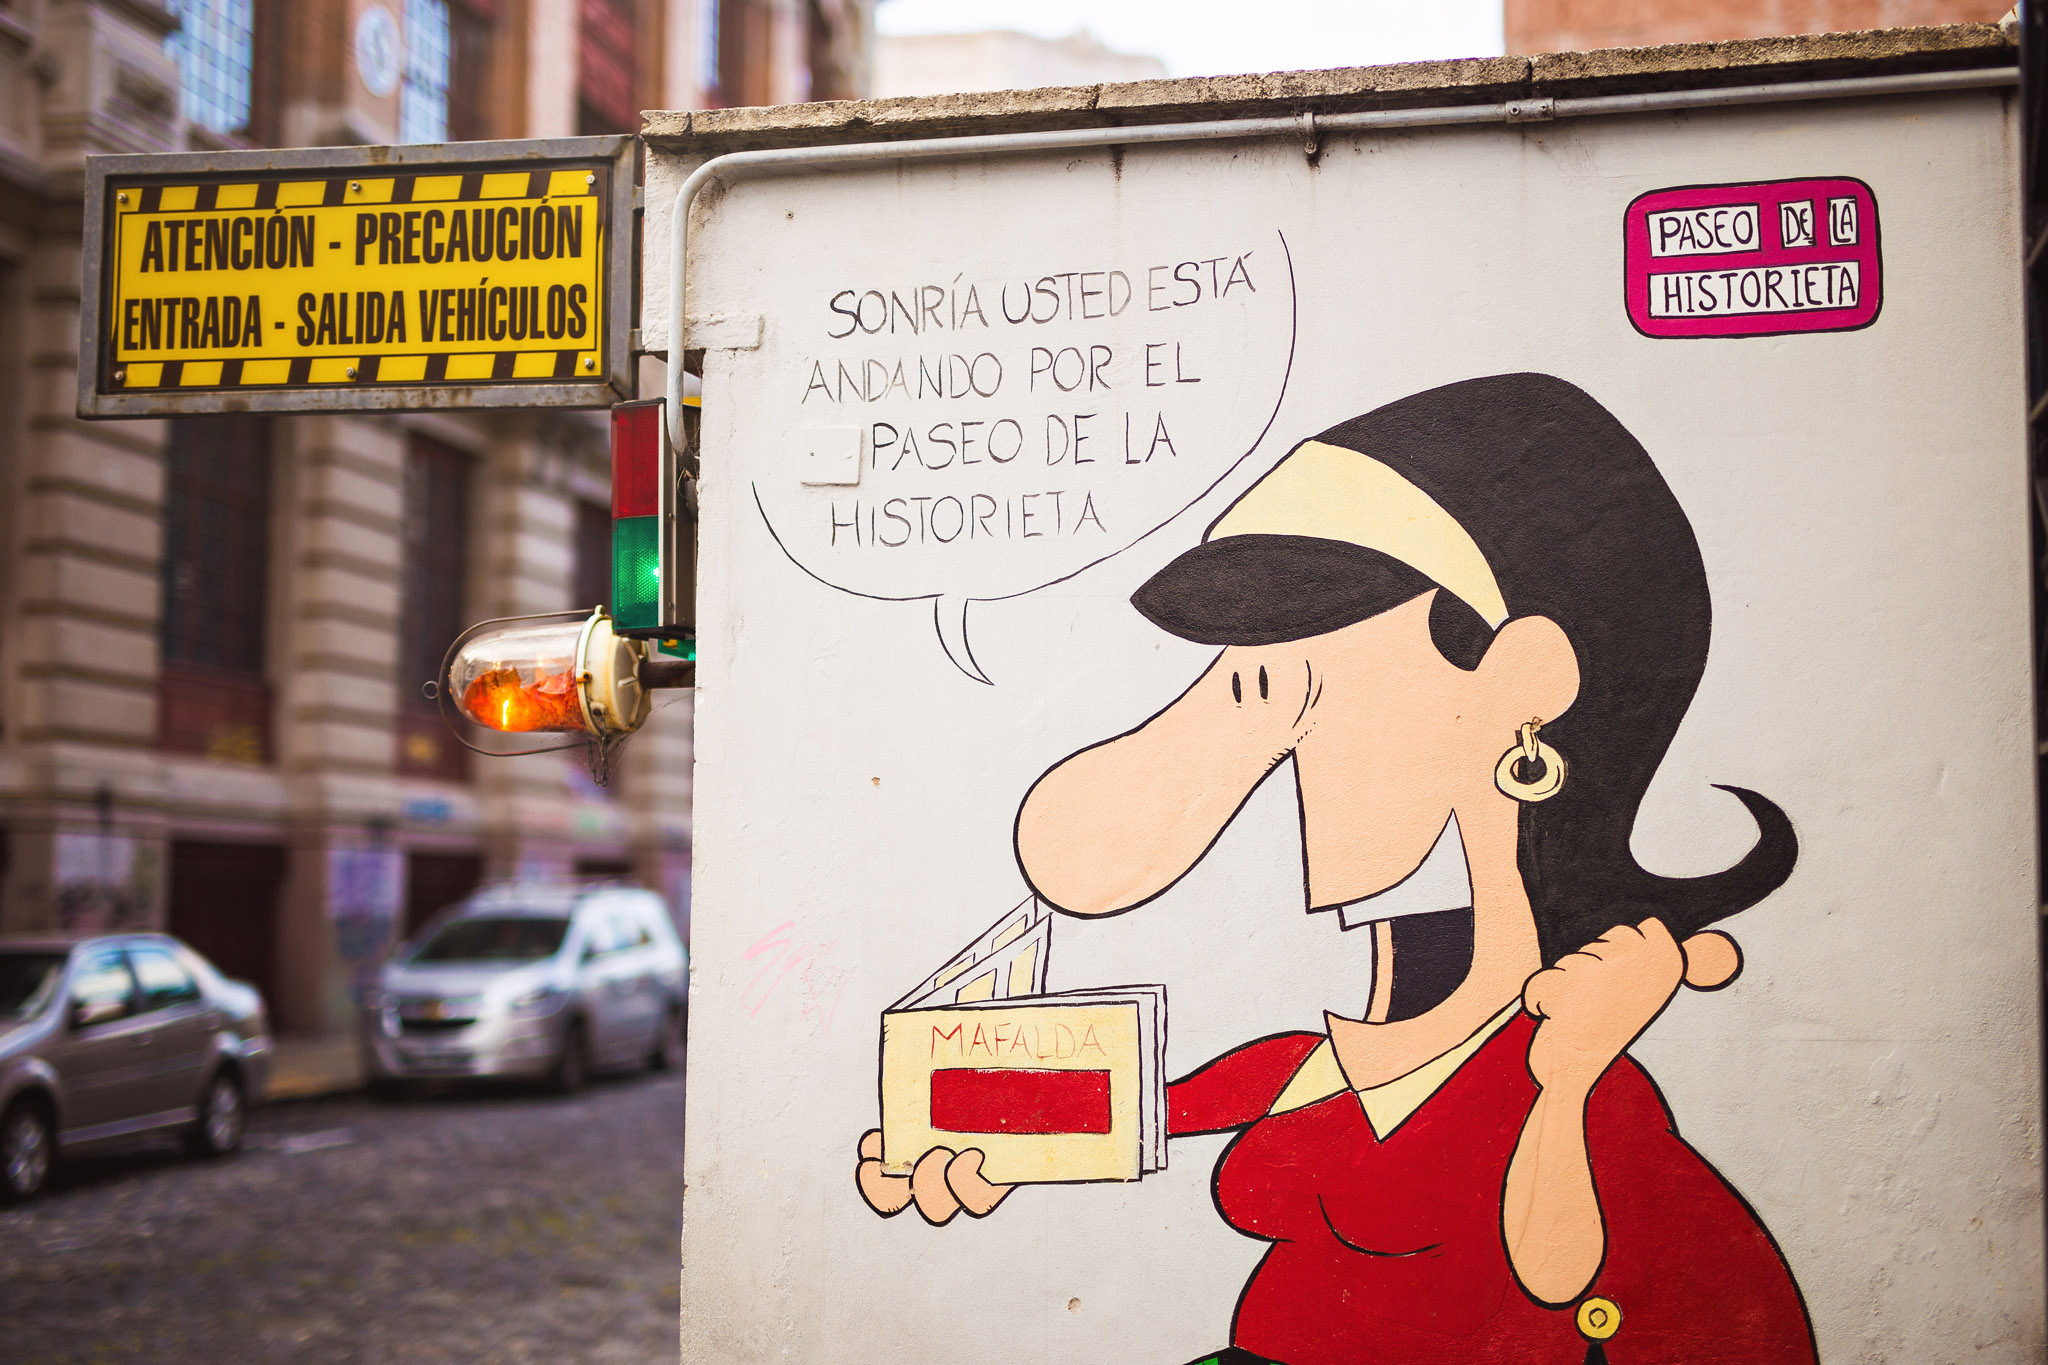 wedding-travellers-argentina-buenos-aires-paseo-historieta-mafalda